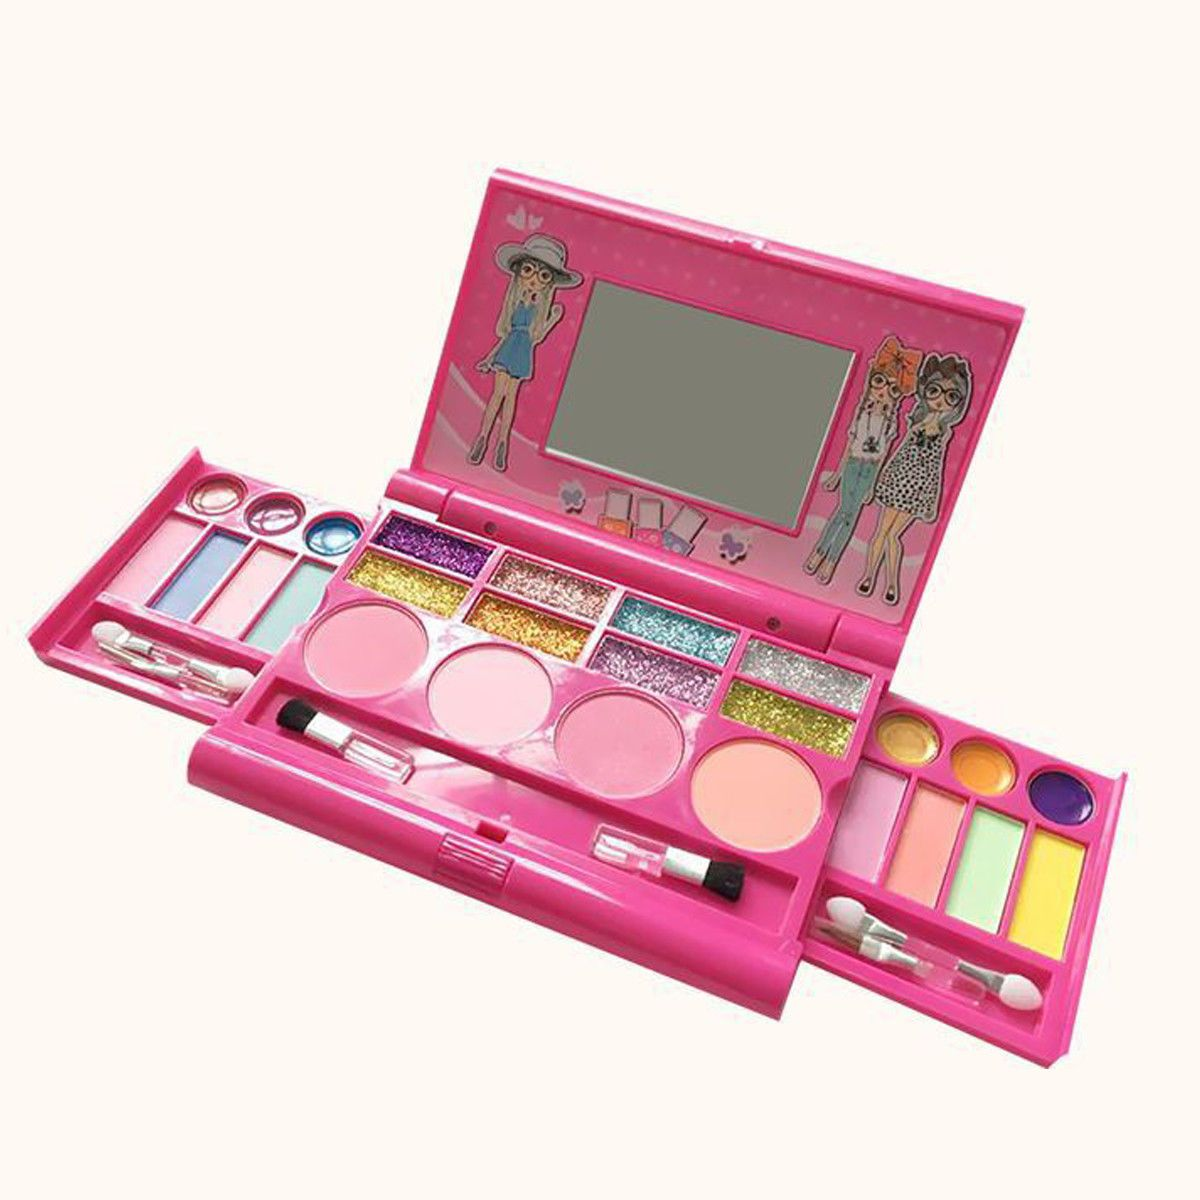 Princess Makeup Set Toy For Kids Cosmetic Girls Kit Eyeshadow Lip Gloss Blushes Makeup Kit For Kids Kids Makeup Princess Makeup